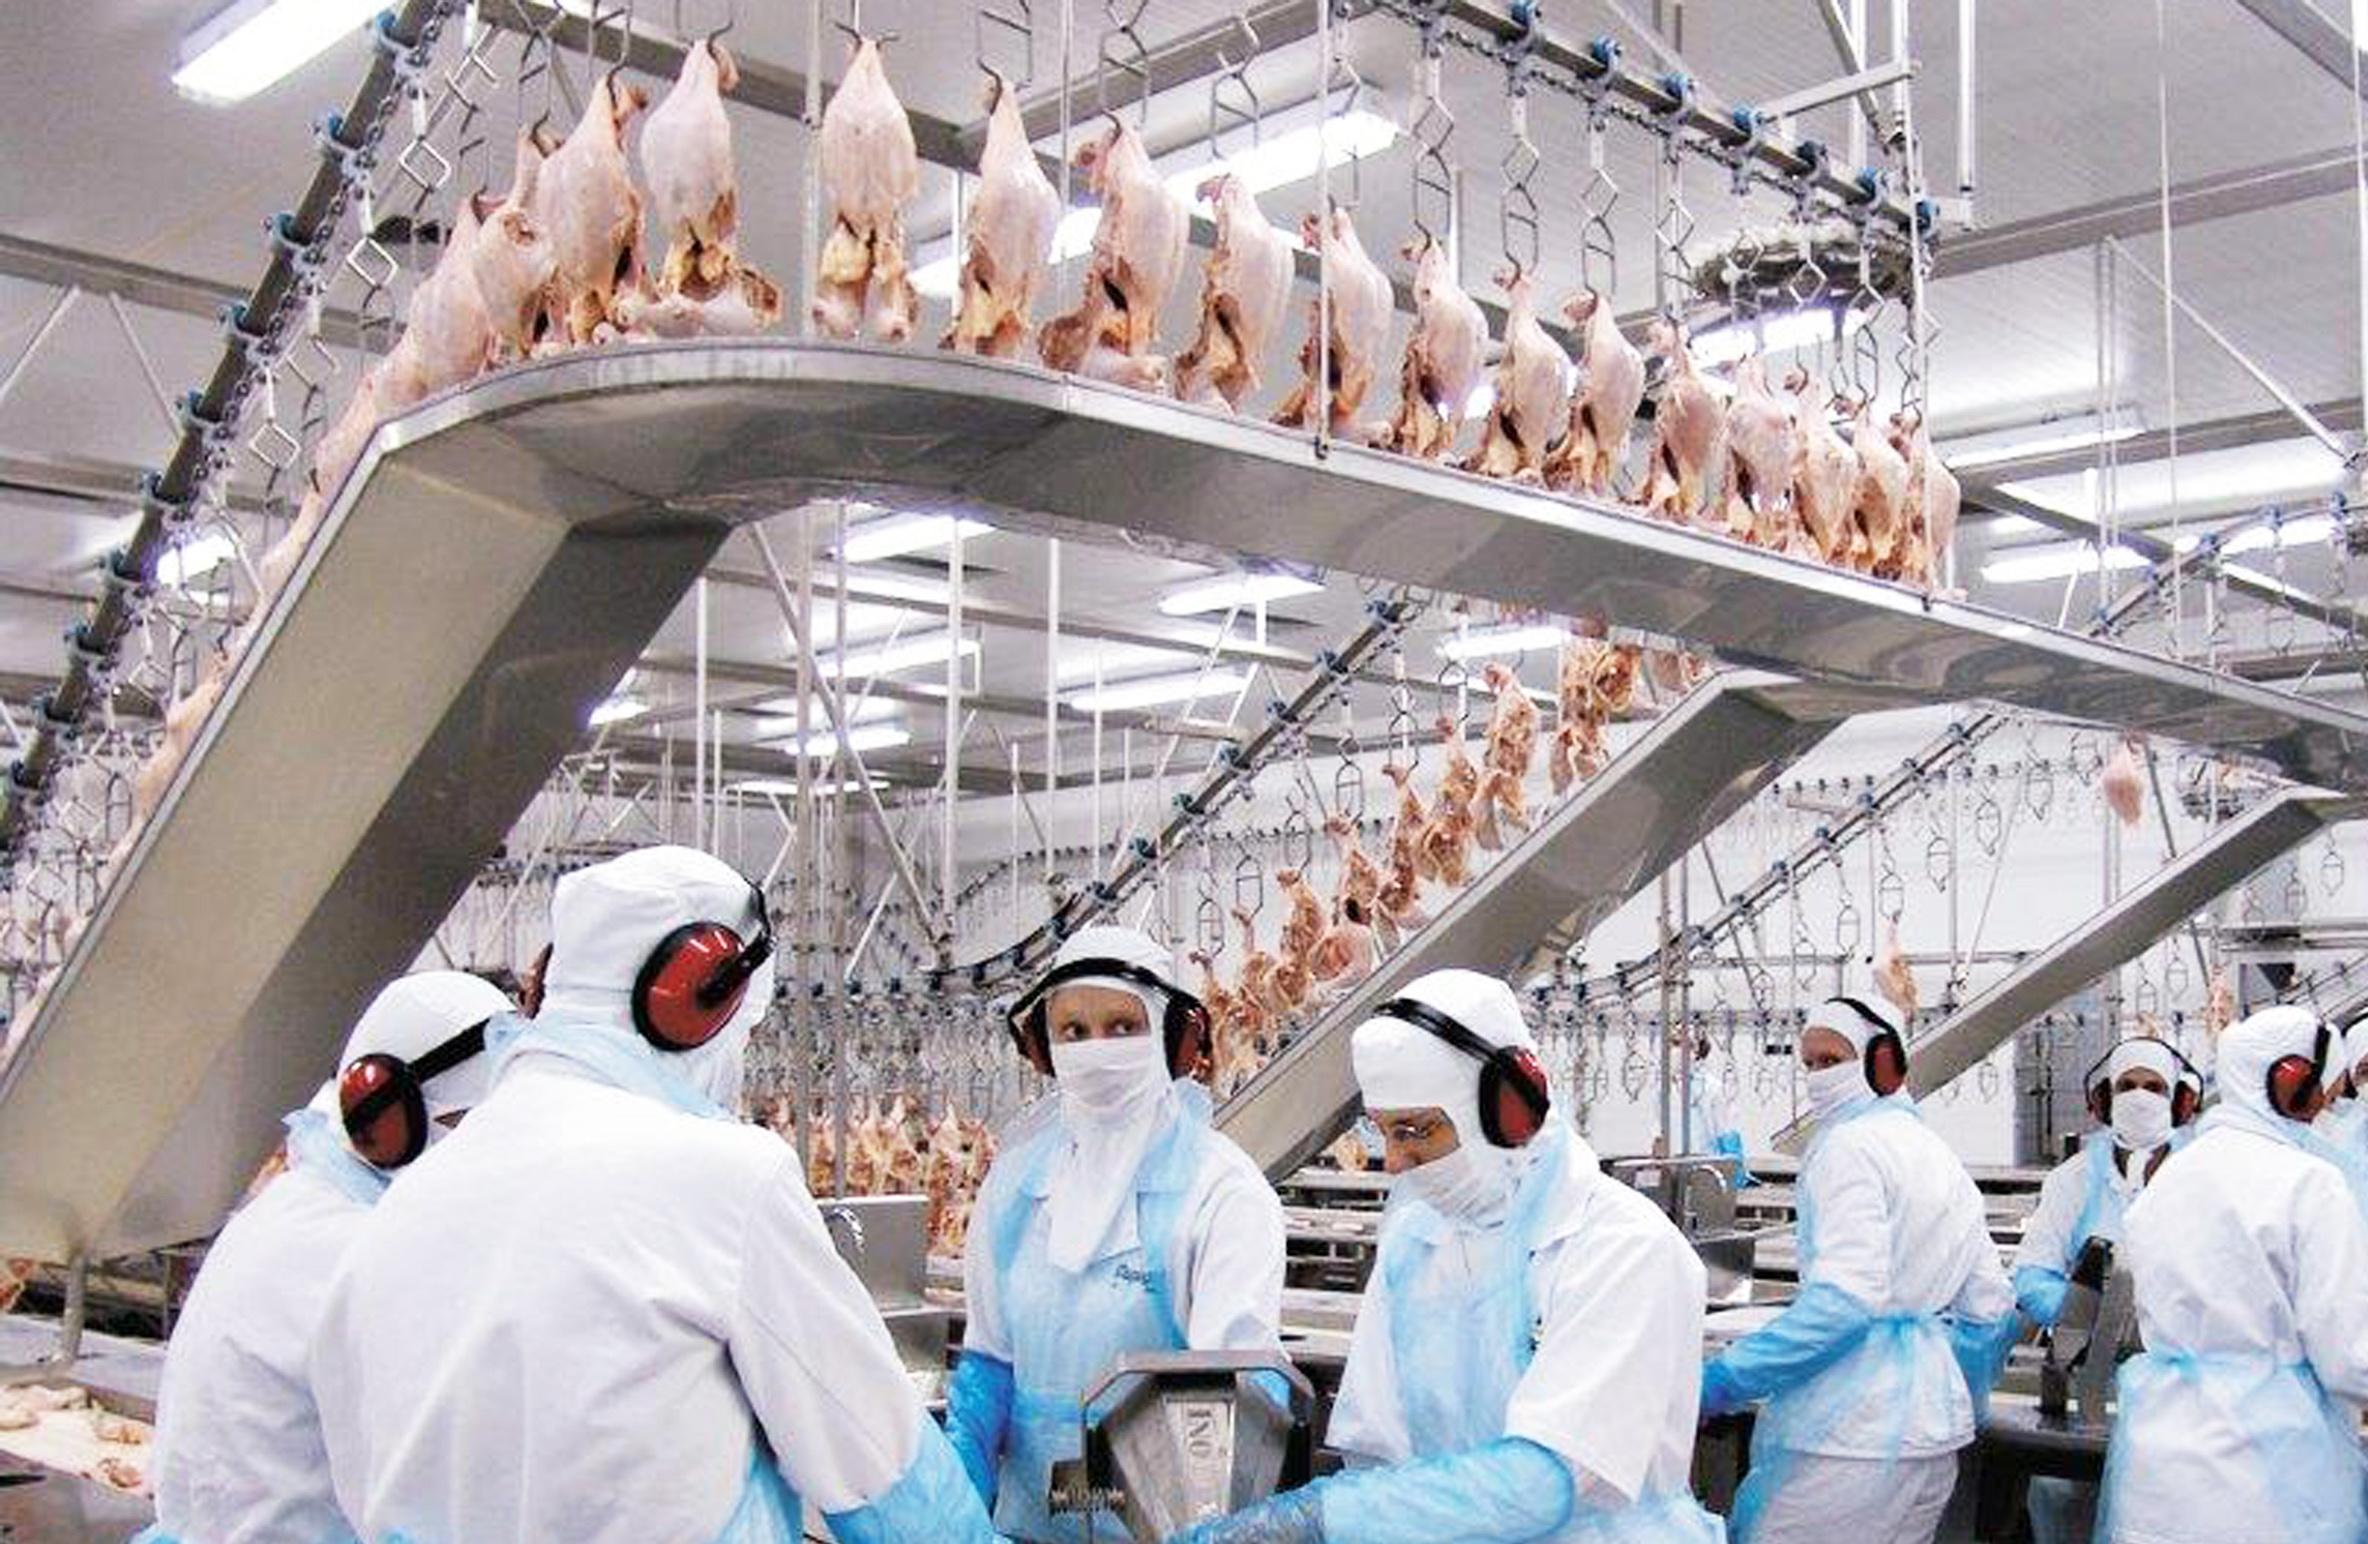 Indústria de Aves Copagril, em Marechal Cândido Rondon.Foto: O Presente